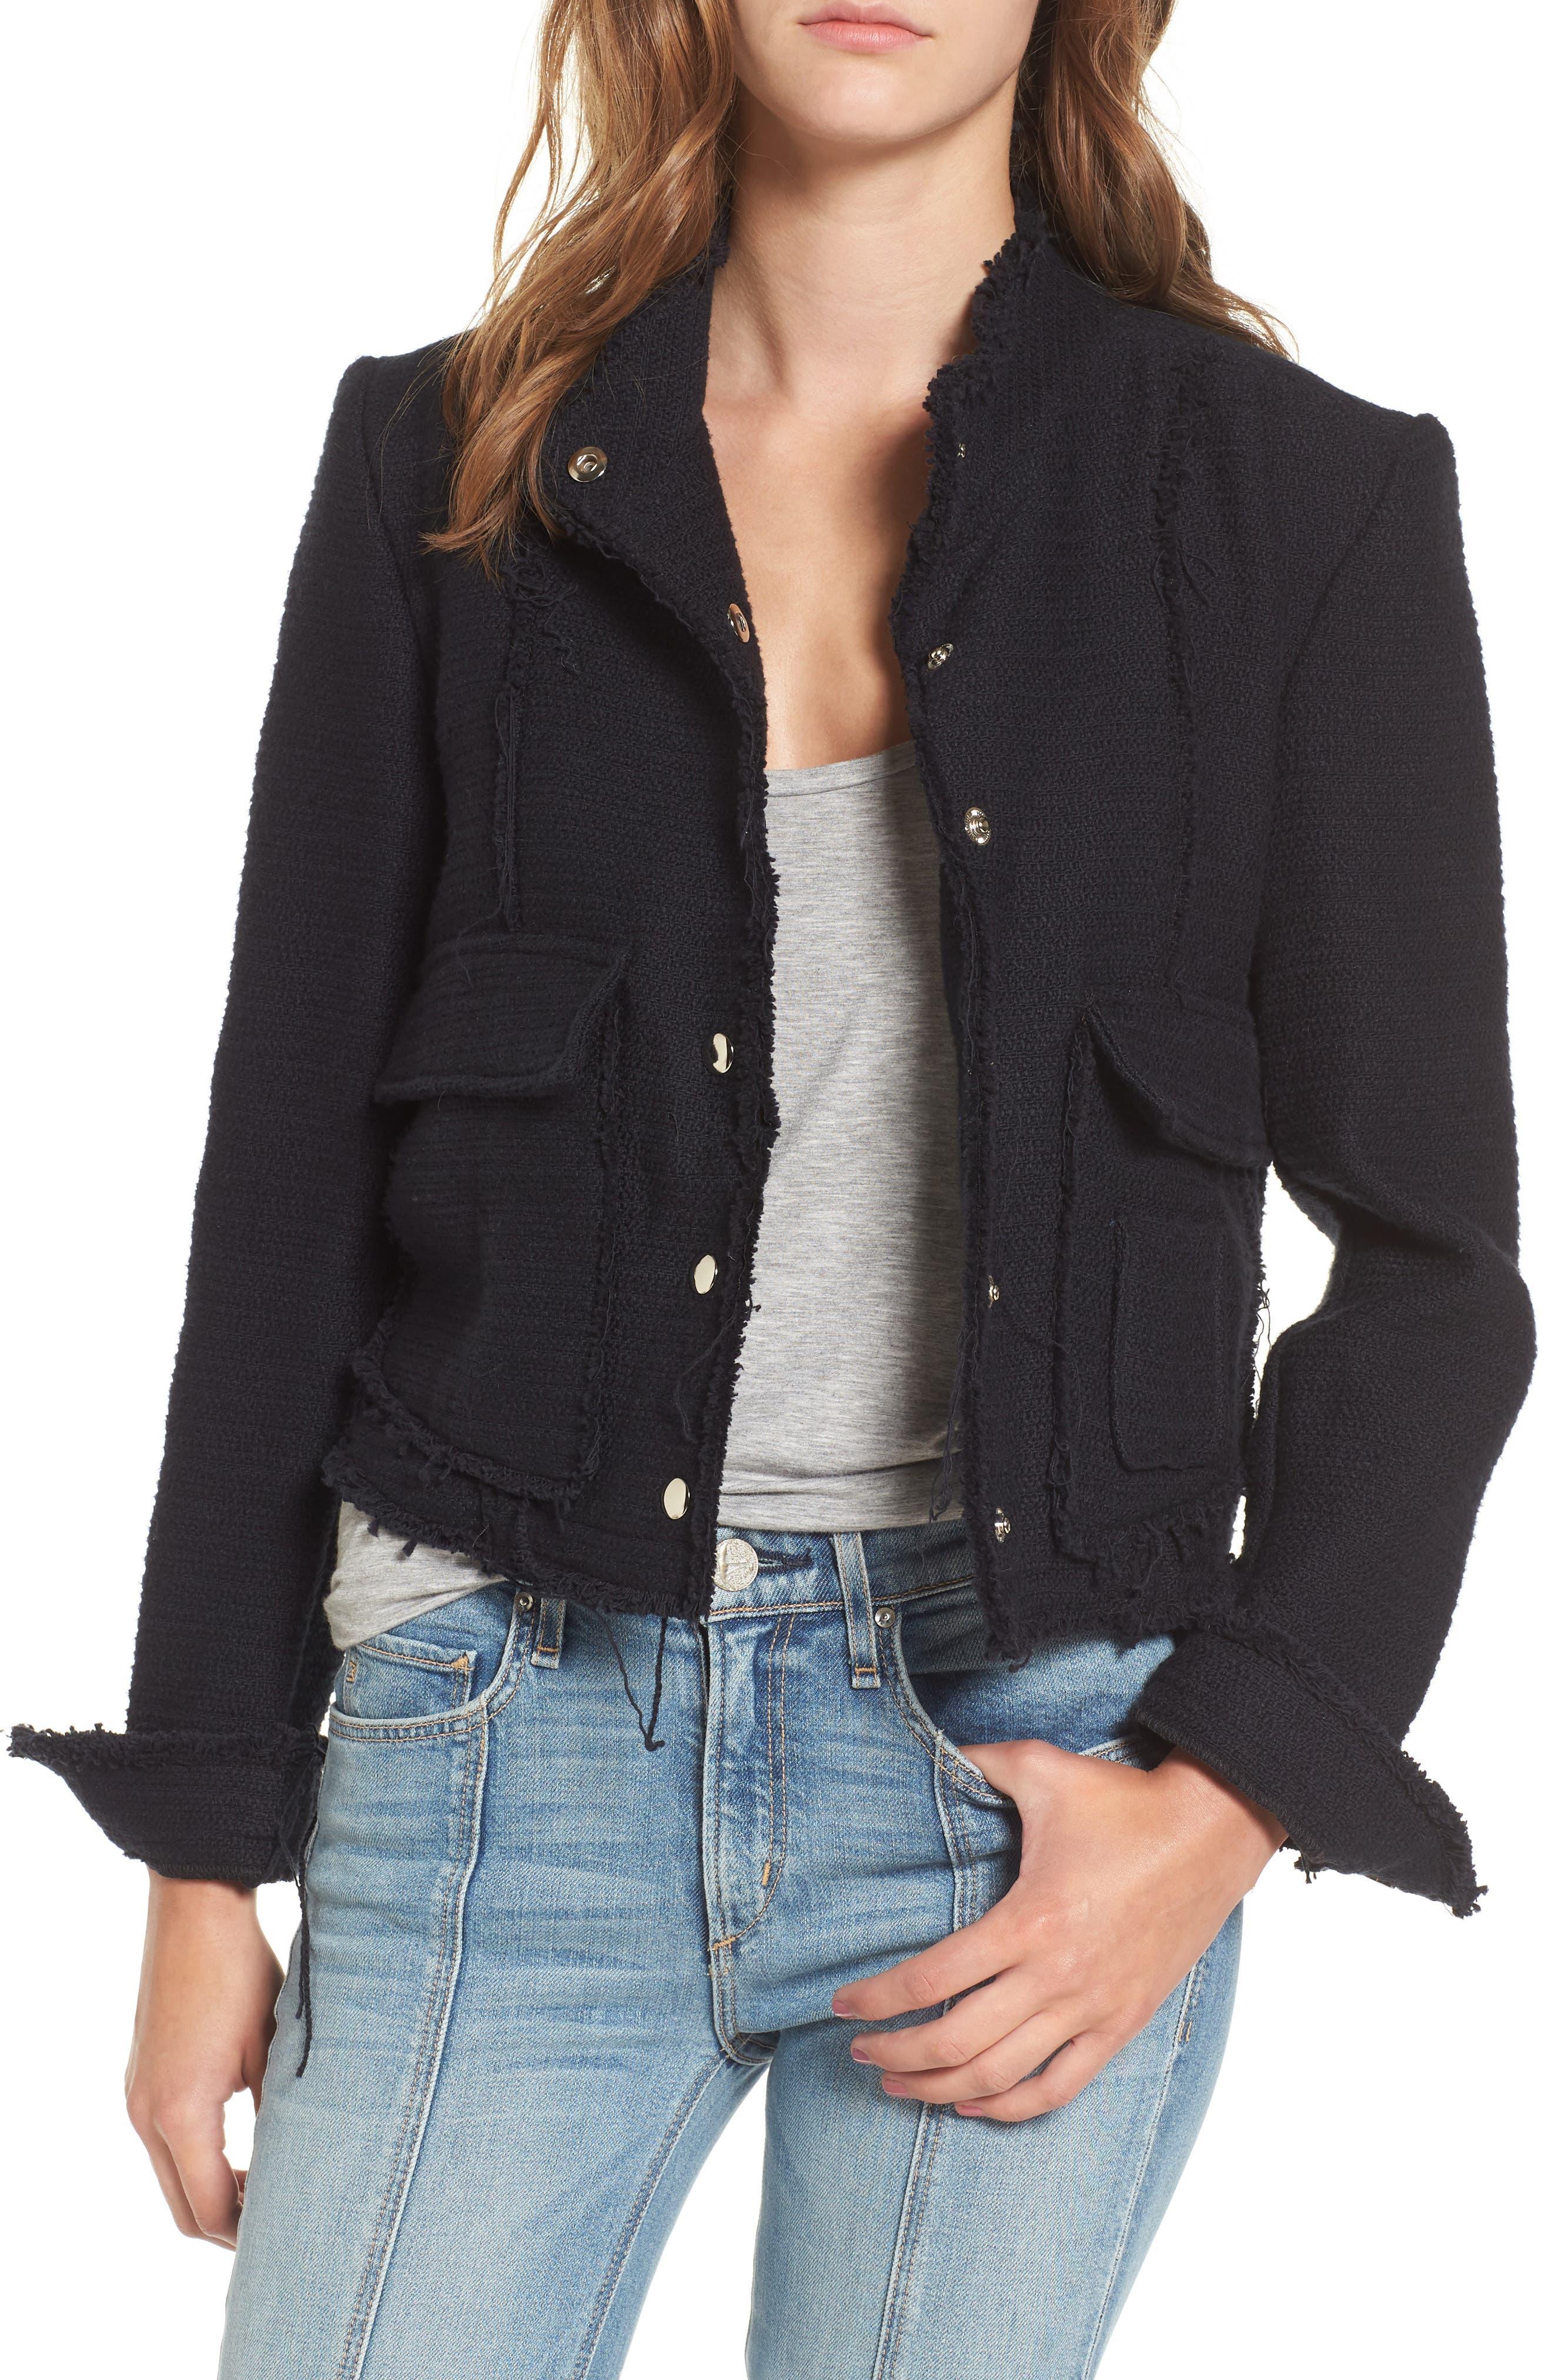 Main Image - McGuire Bloombury Crop Cotton Jacket